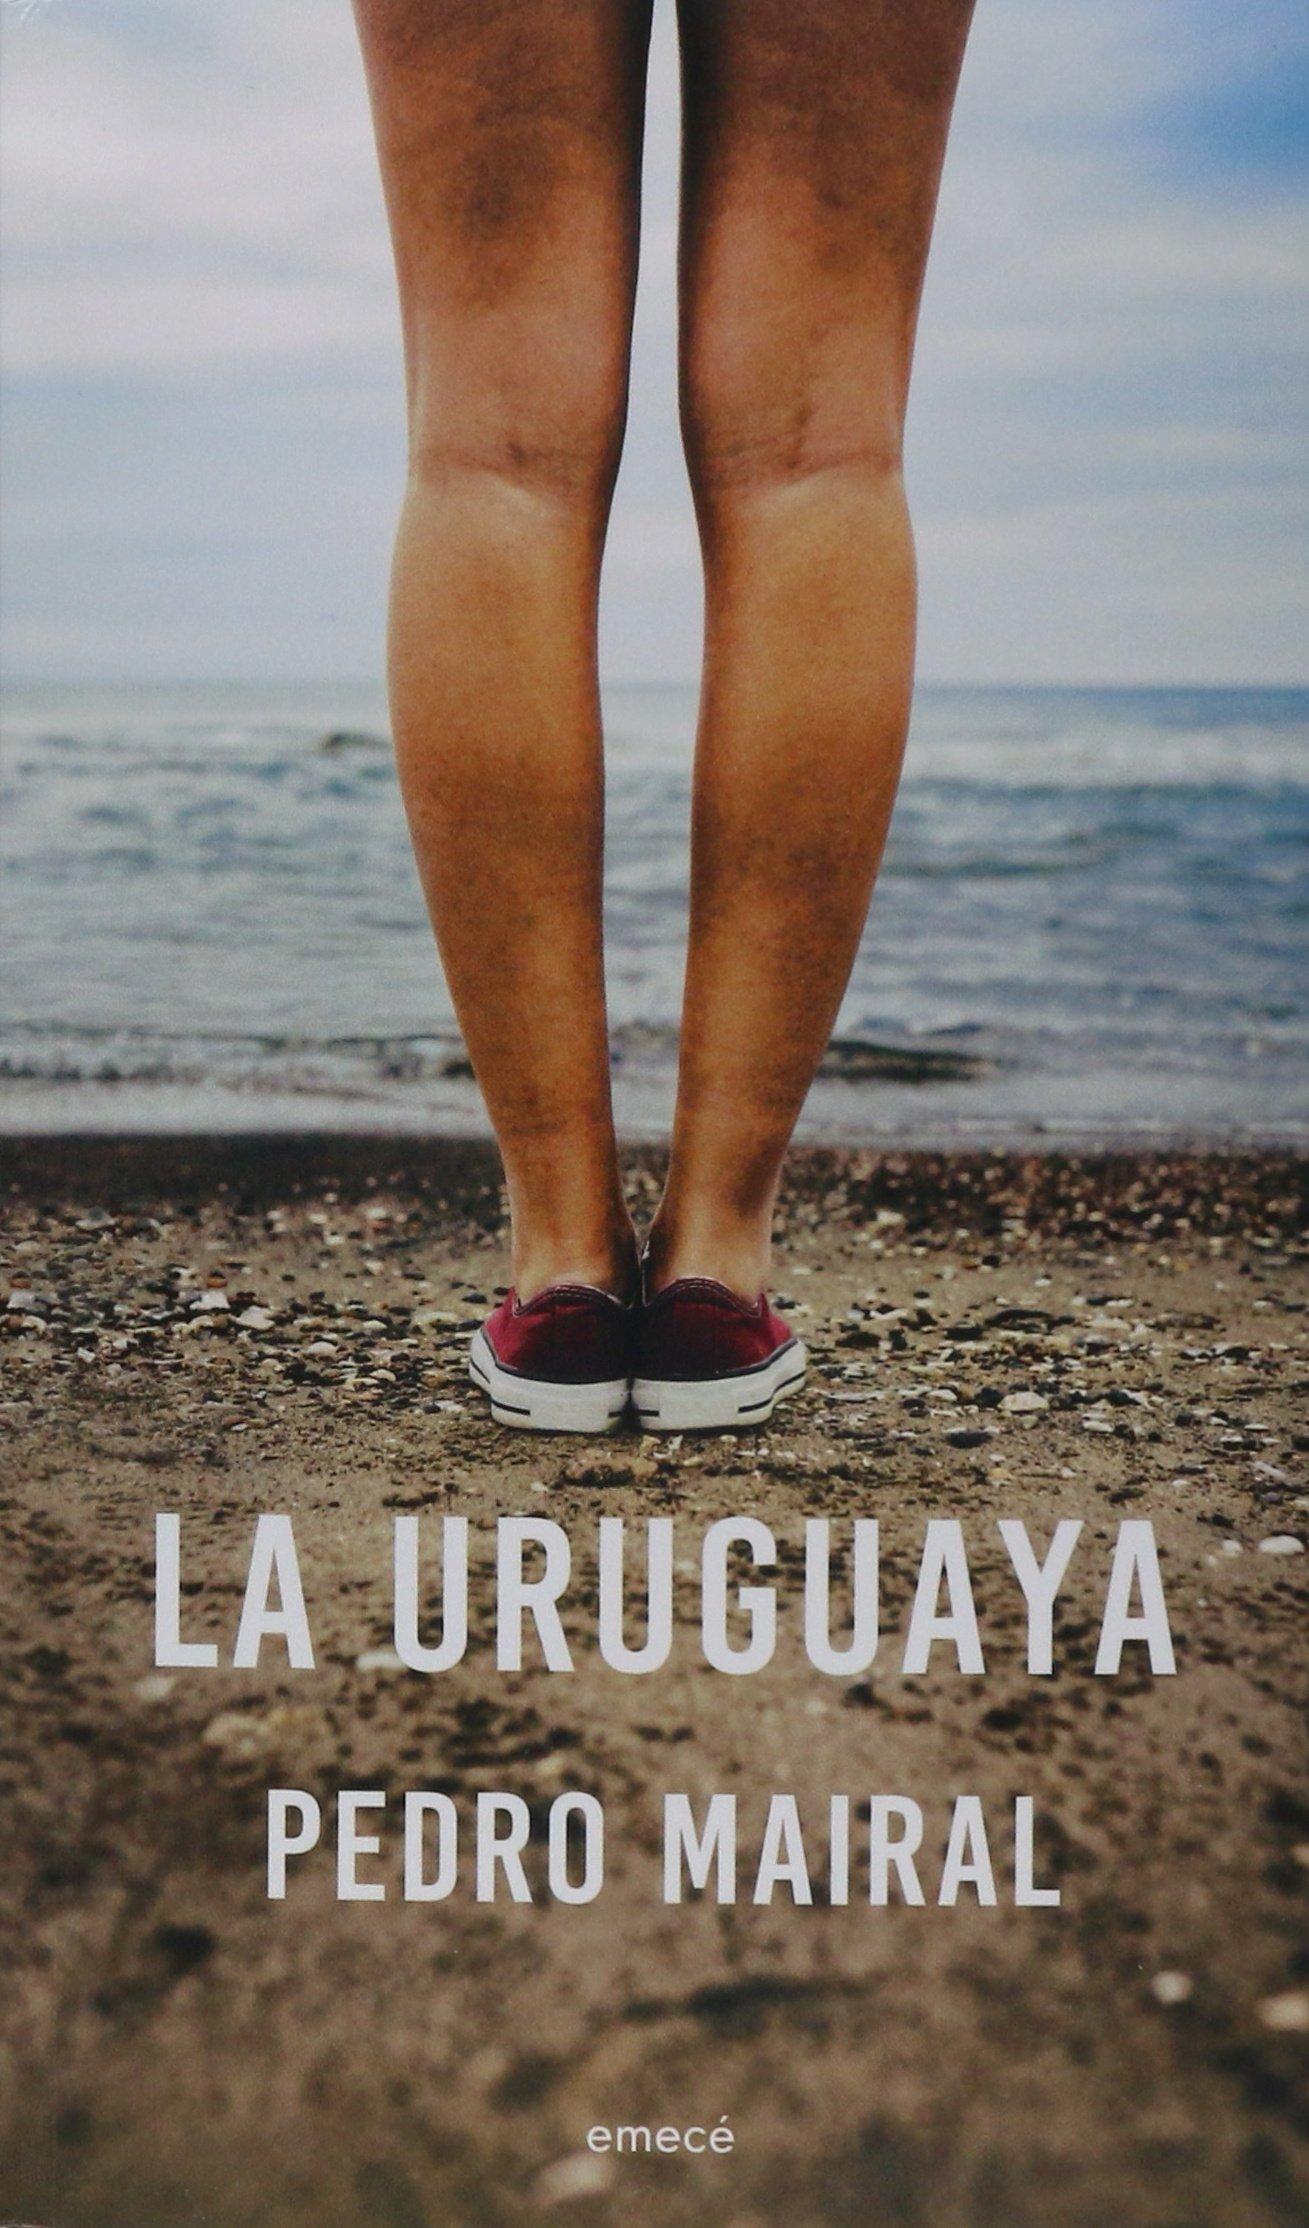 La uruguaya: Mairal, Pedro: Amazon.com.mx: Libros